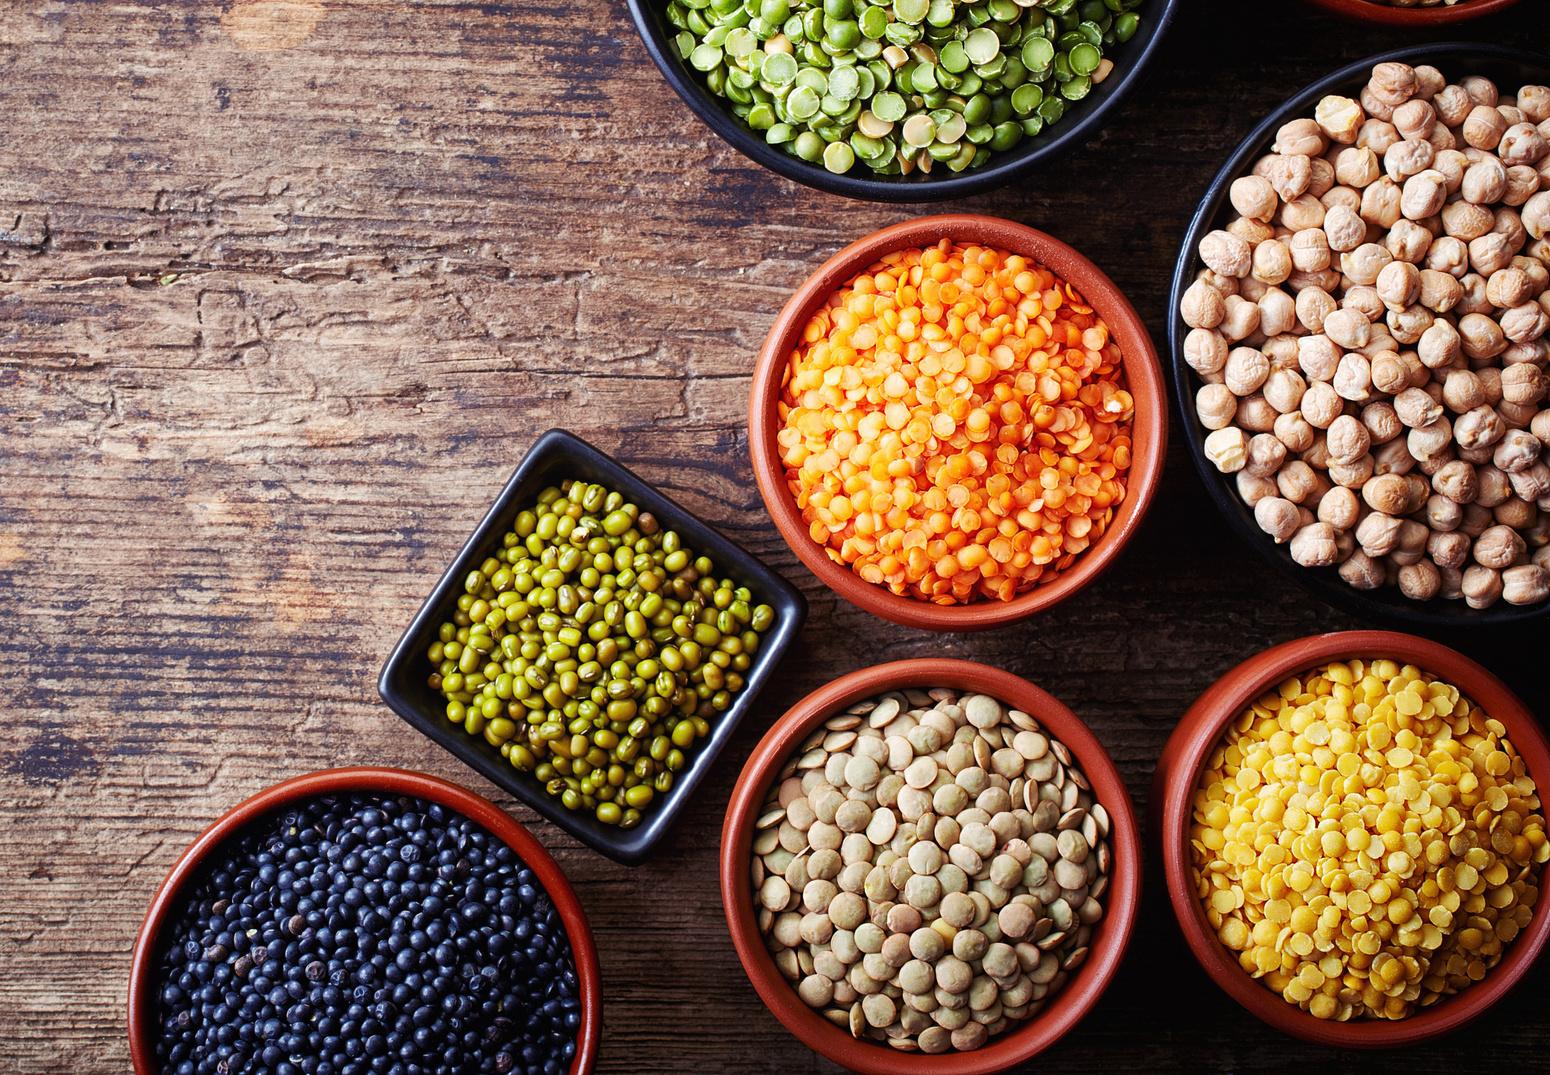 Paleolit étrend • Egészséges életmód • Dietless